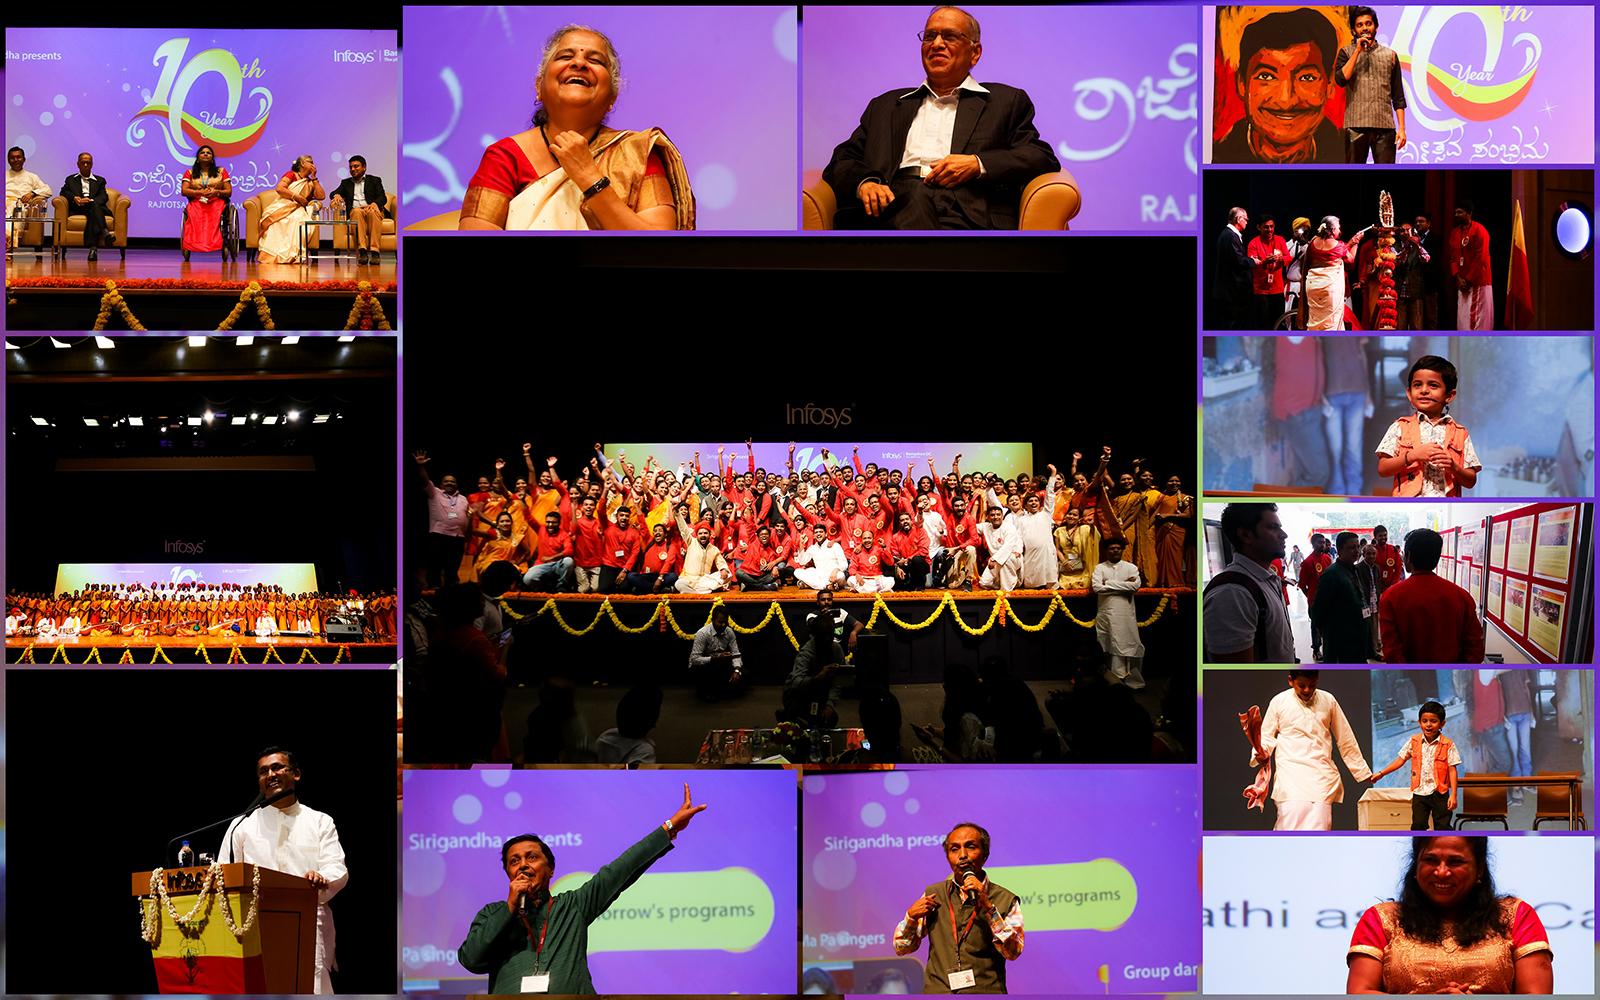 Sneak Peek into Infosys Bangalore DC Concludes 10th Rajyotsava Sambhrama